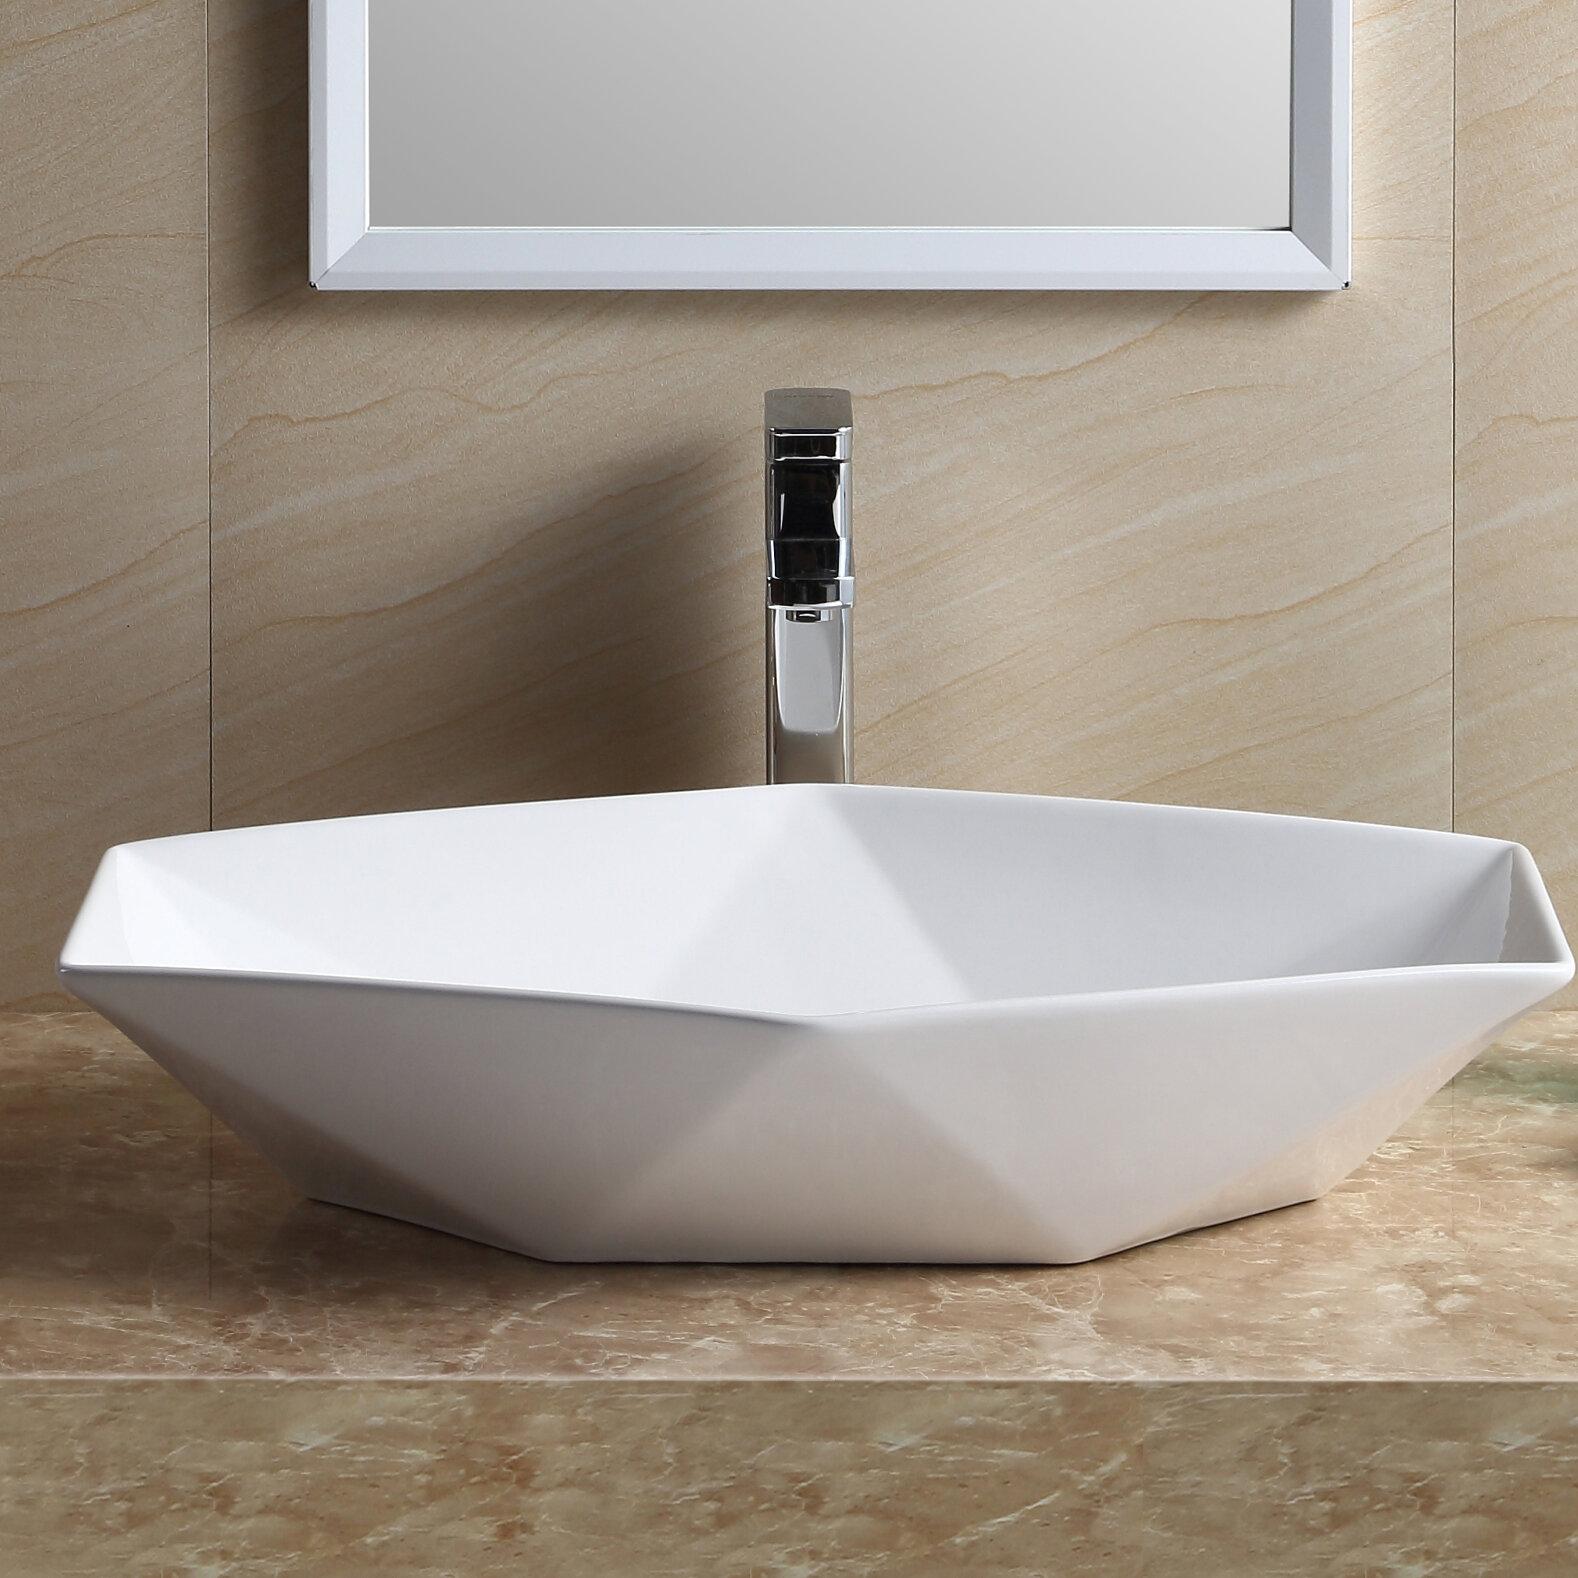 amazing Wayfair Vessel Sinks Part - 6: Fine Fixtures Modern Vitreous China Specialty Vessel Bathroom Sink u0026  Reviews | Wayfair